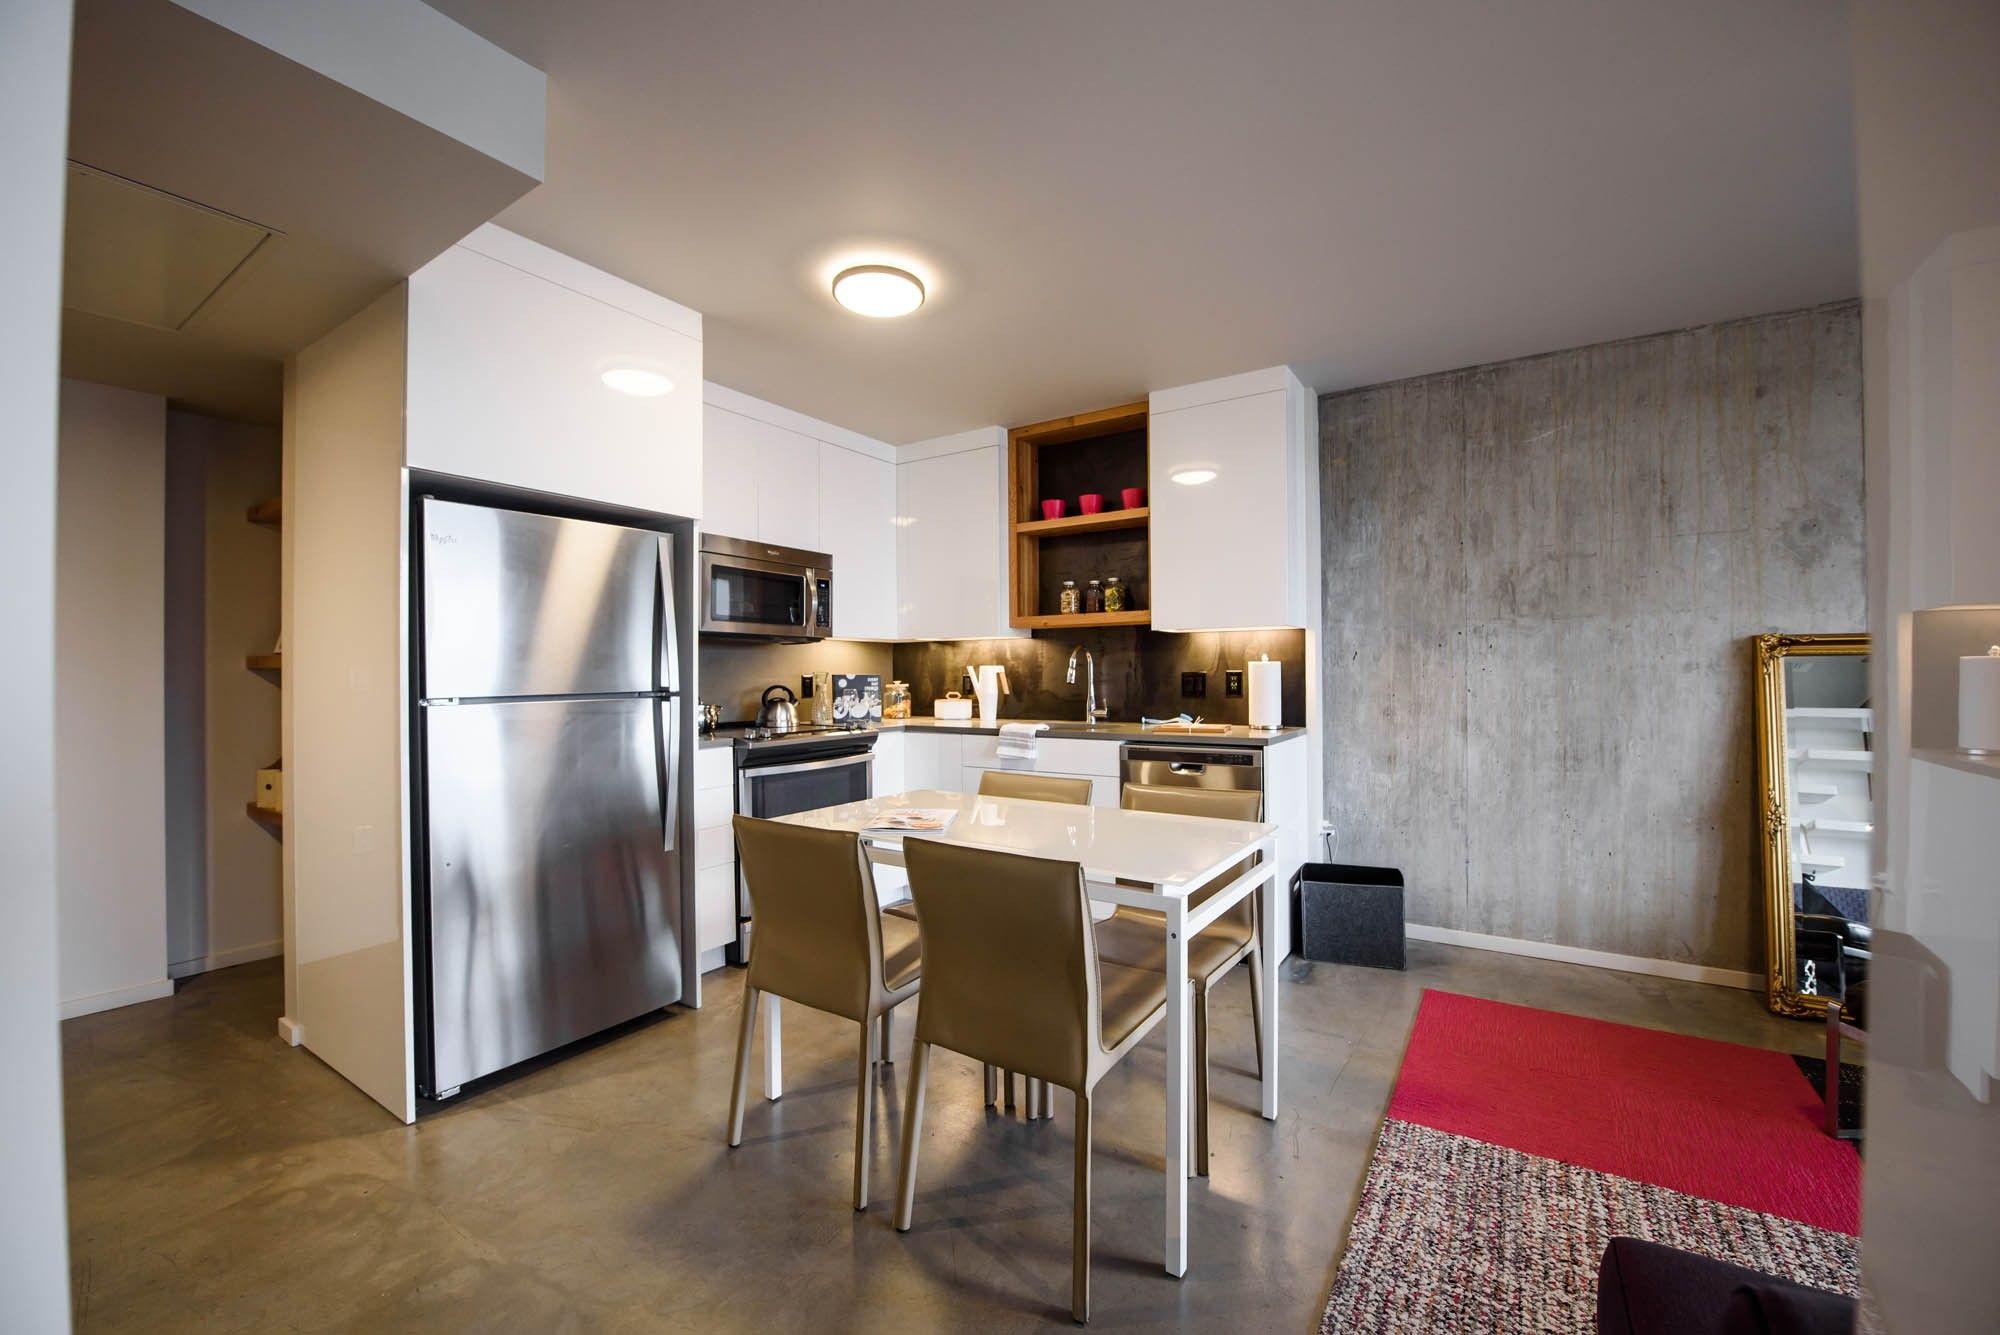 Luxury Apartments in Northwest Portland, OR | Q21 Apts | Apartment ...